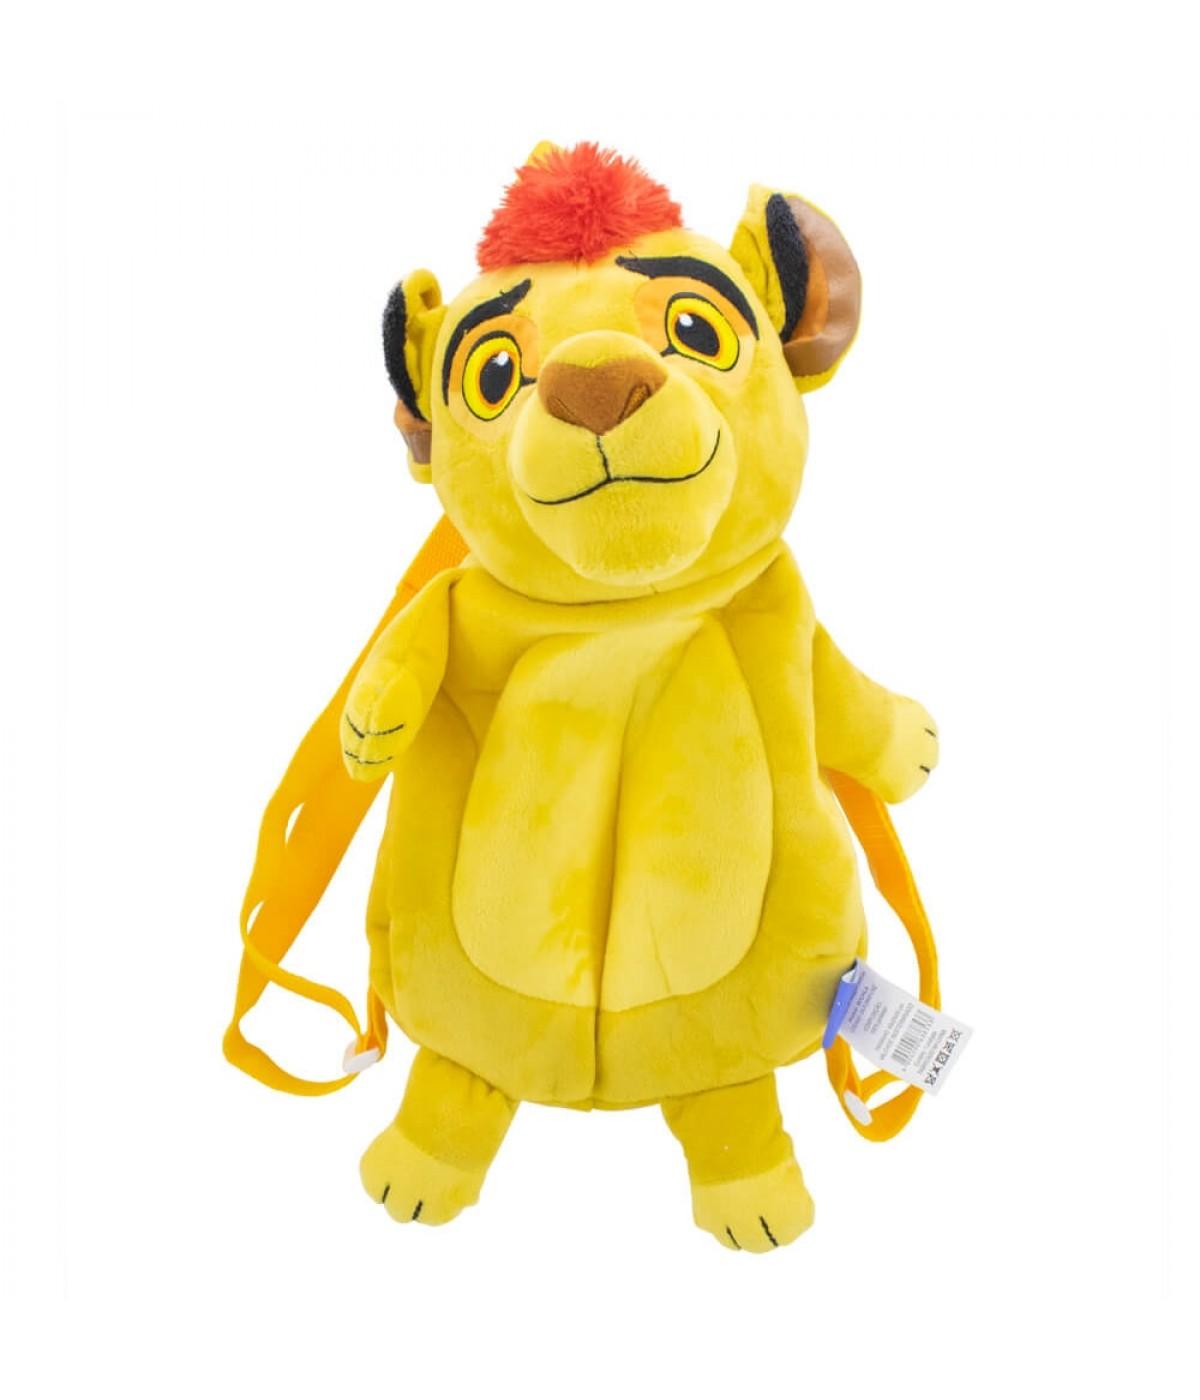 Mochila Infantil Kion Guarda Do Leão 43x23cm - Disney